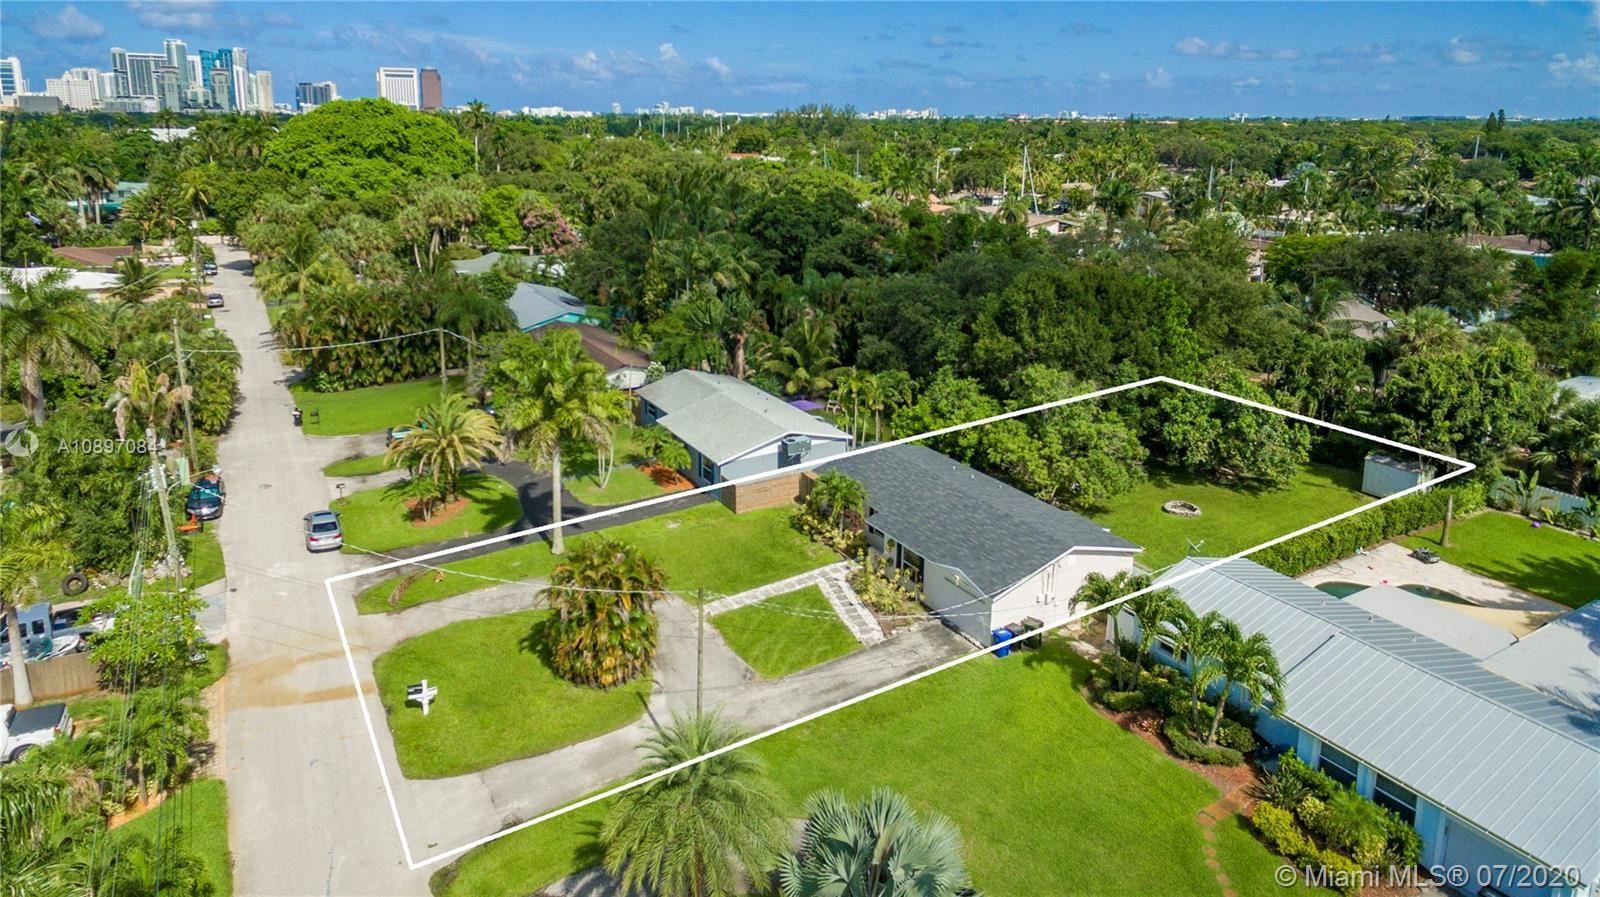 1724 SW 4th St, Fort Lauderdale, FL 33312 - #: A10897084